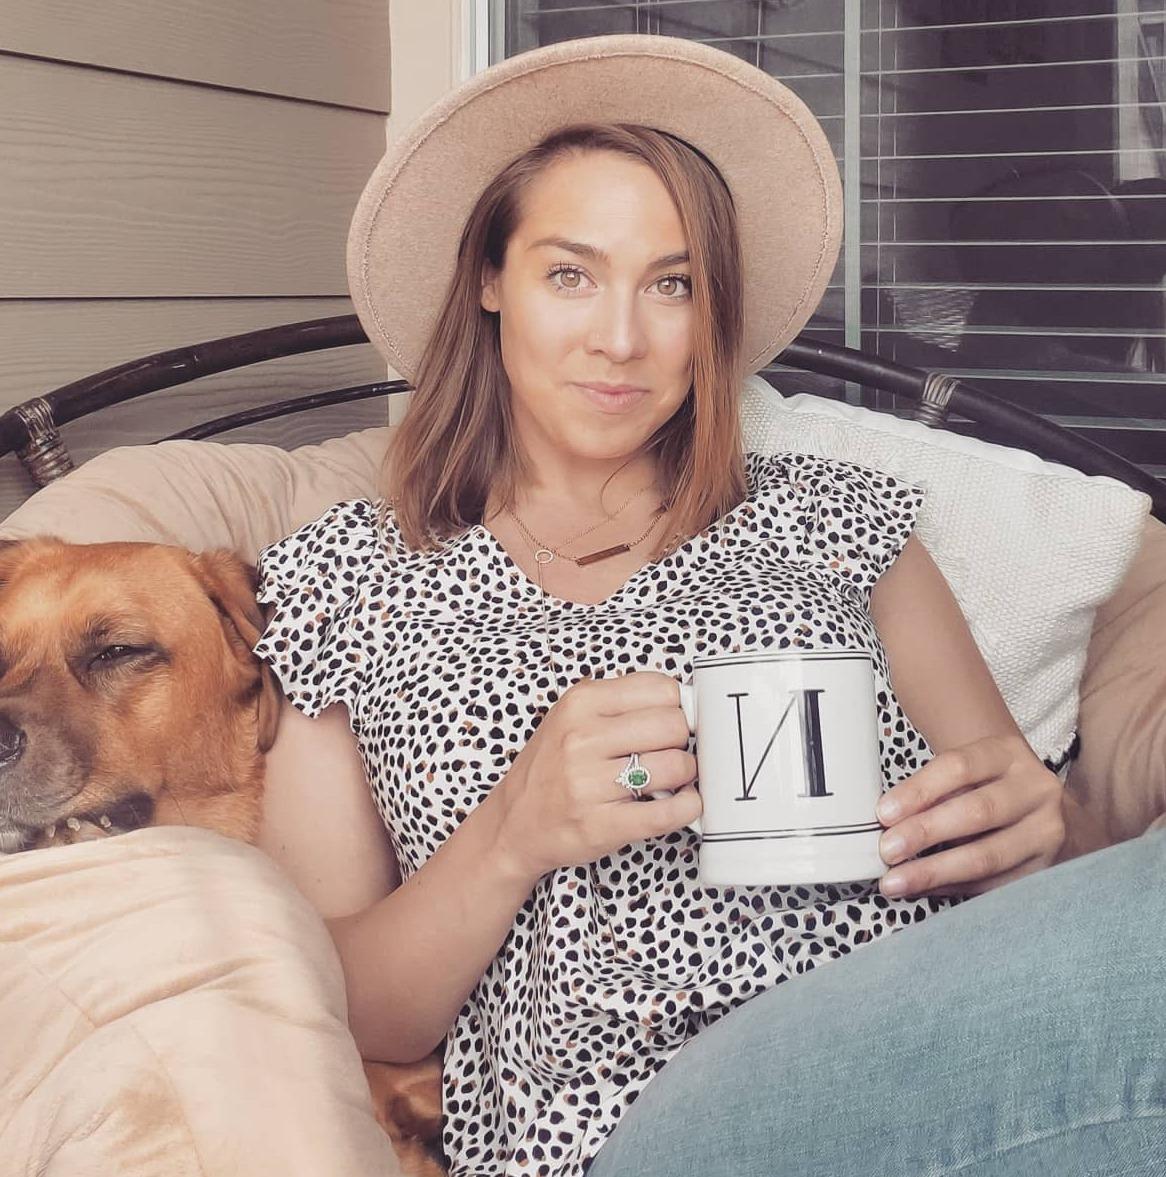 Nicole Ramirez coffee cup and dog